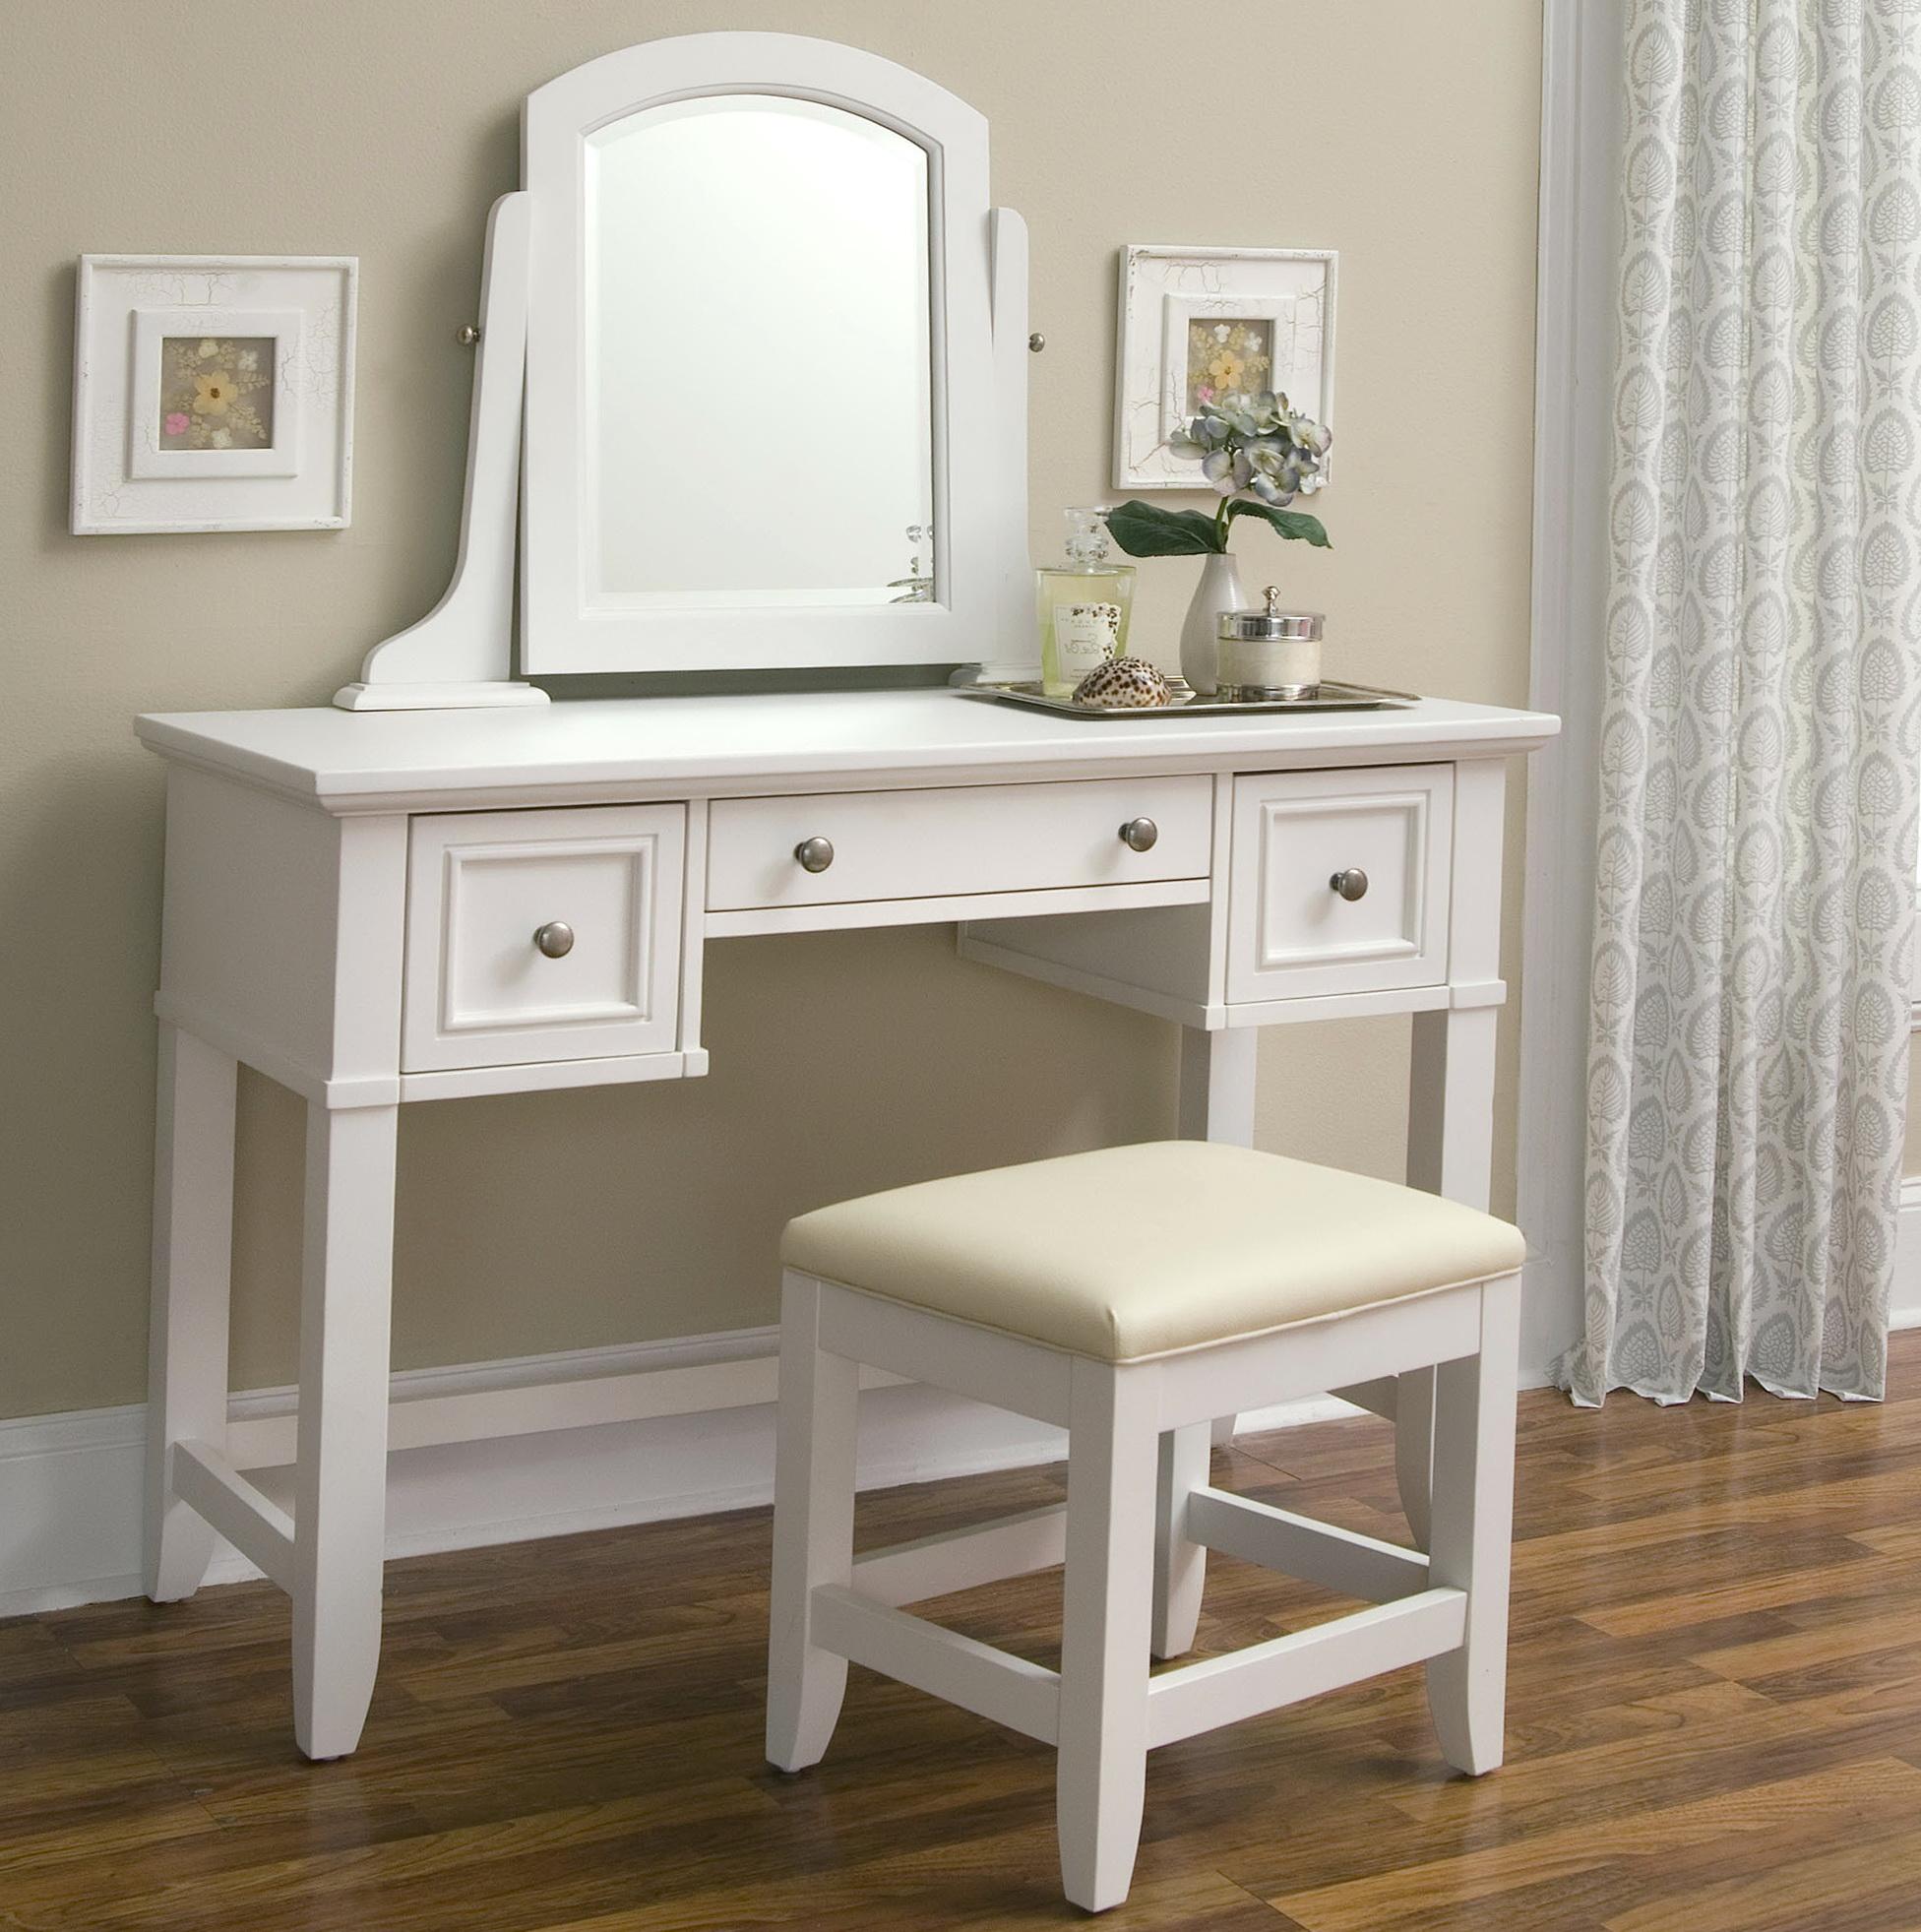 Vanity Table With Mirror Ikea